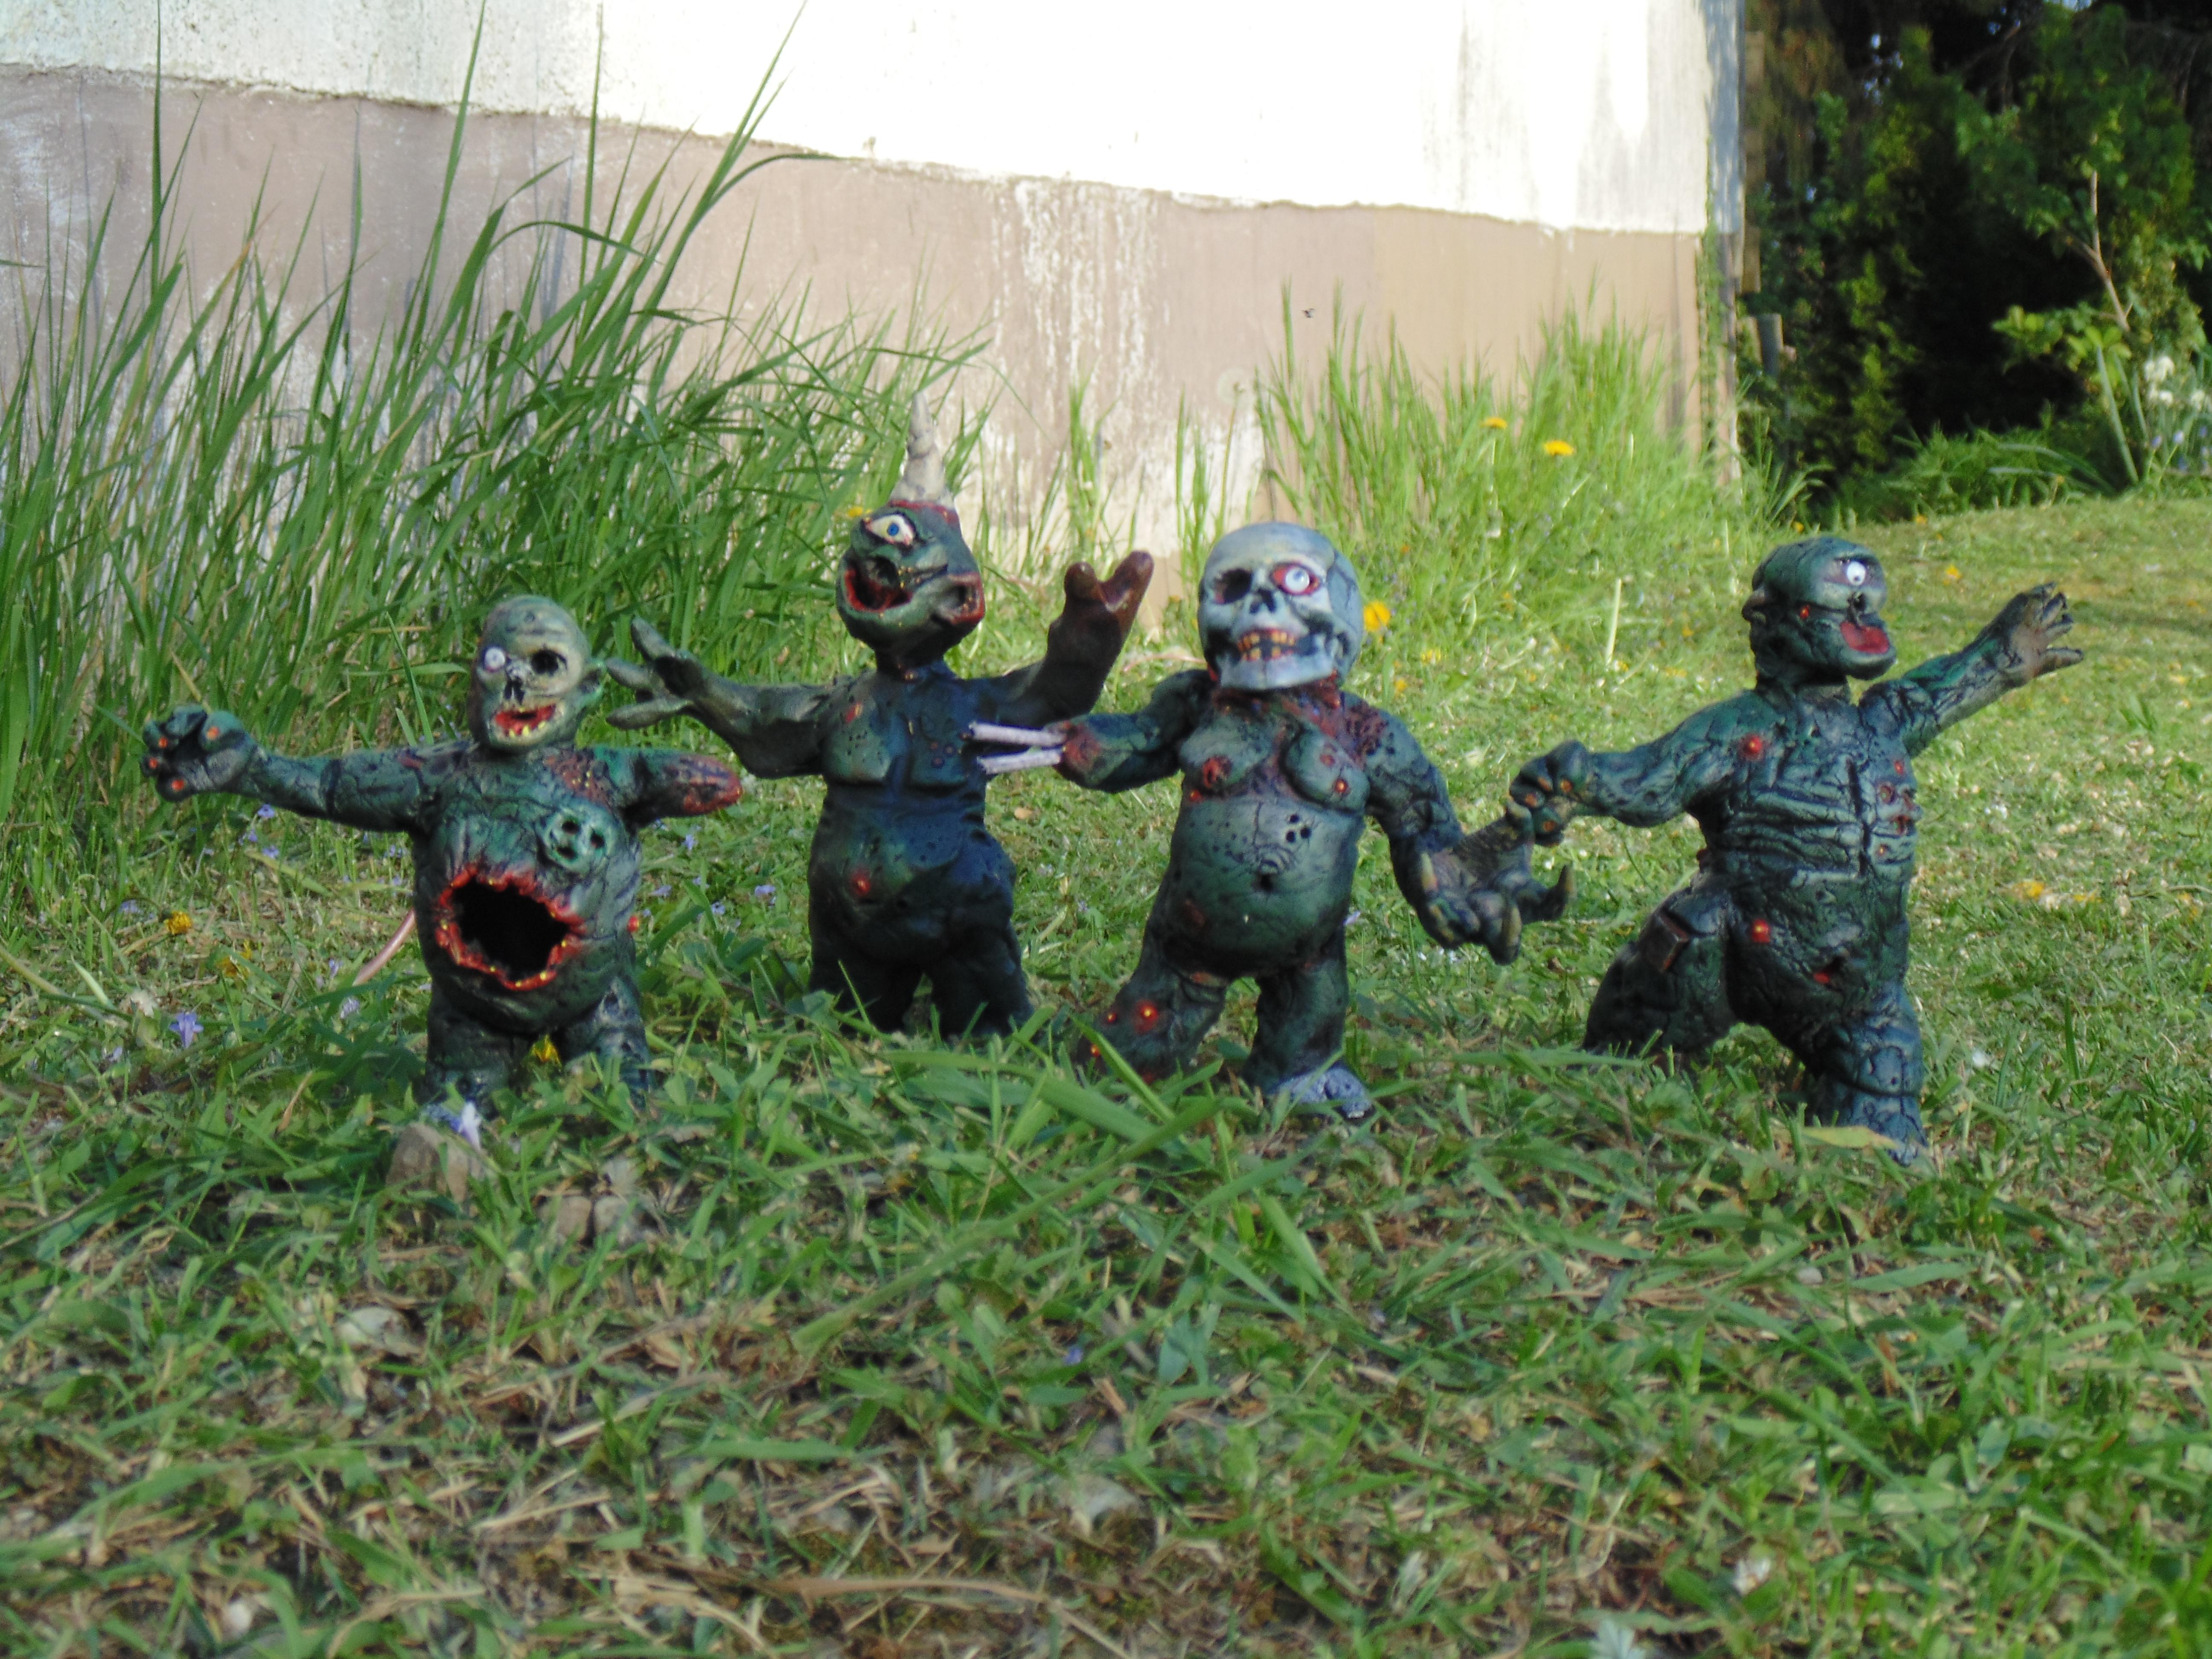 Chaos Nurgle, Conversion, Daemons, Garden, Gnome, Guo, Nurgle, Plague, Plaguebearers, Prince, Scratch